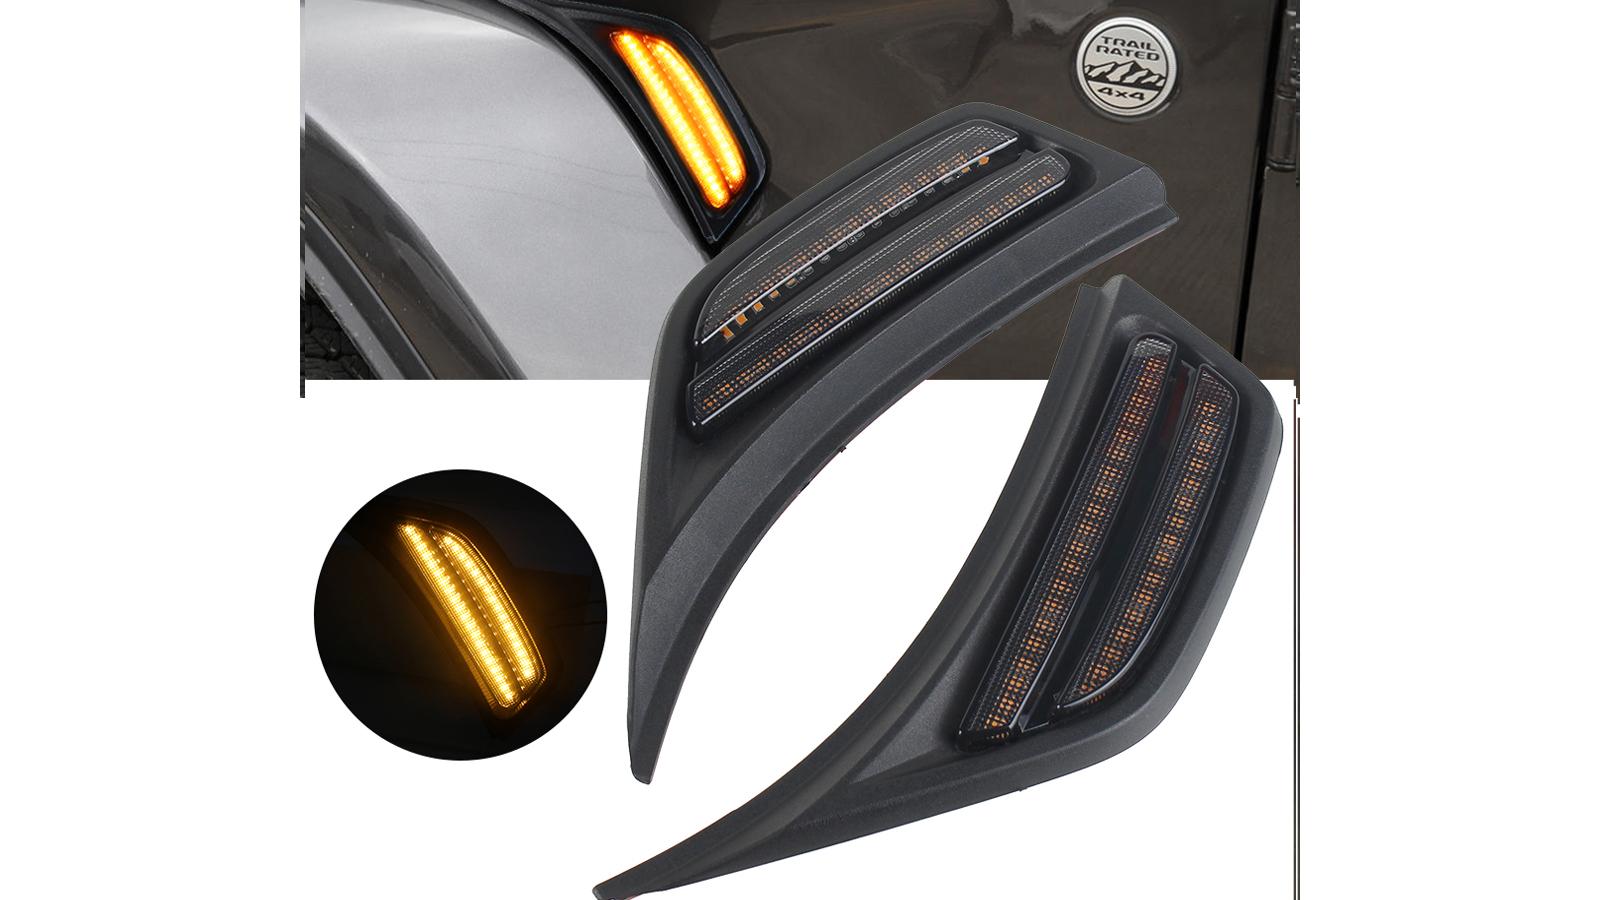 LED Fenderマーカーサイドライトターンシグナルランプ用JLU 2018+